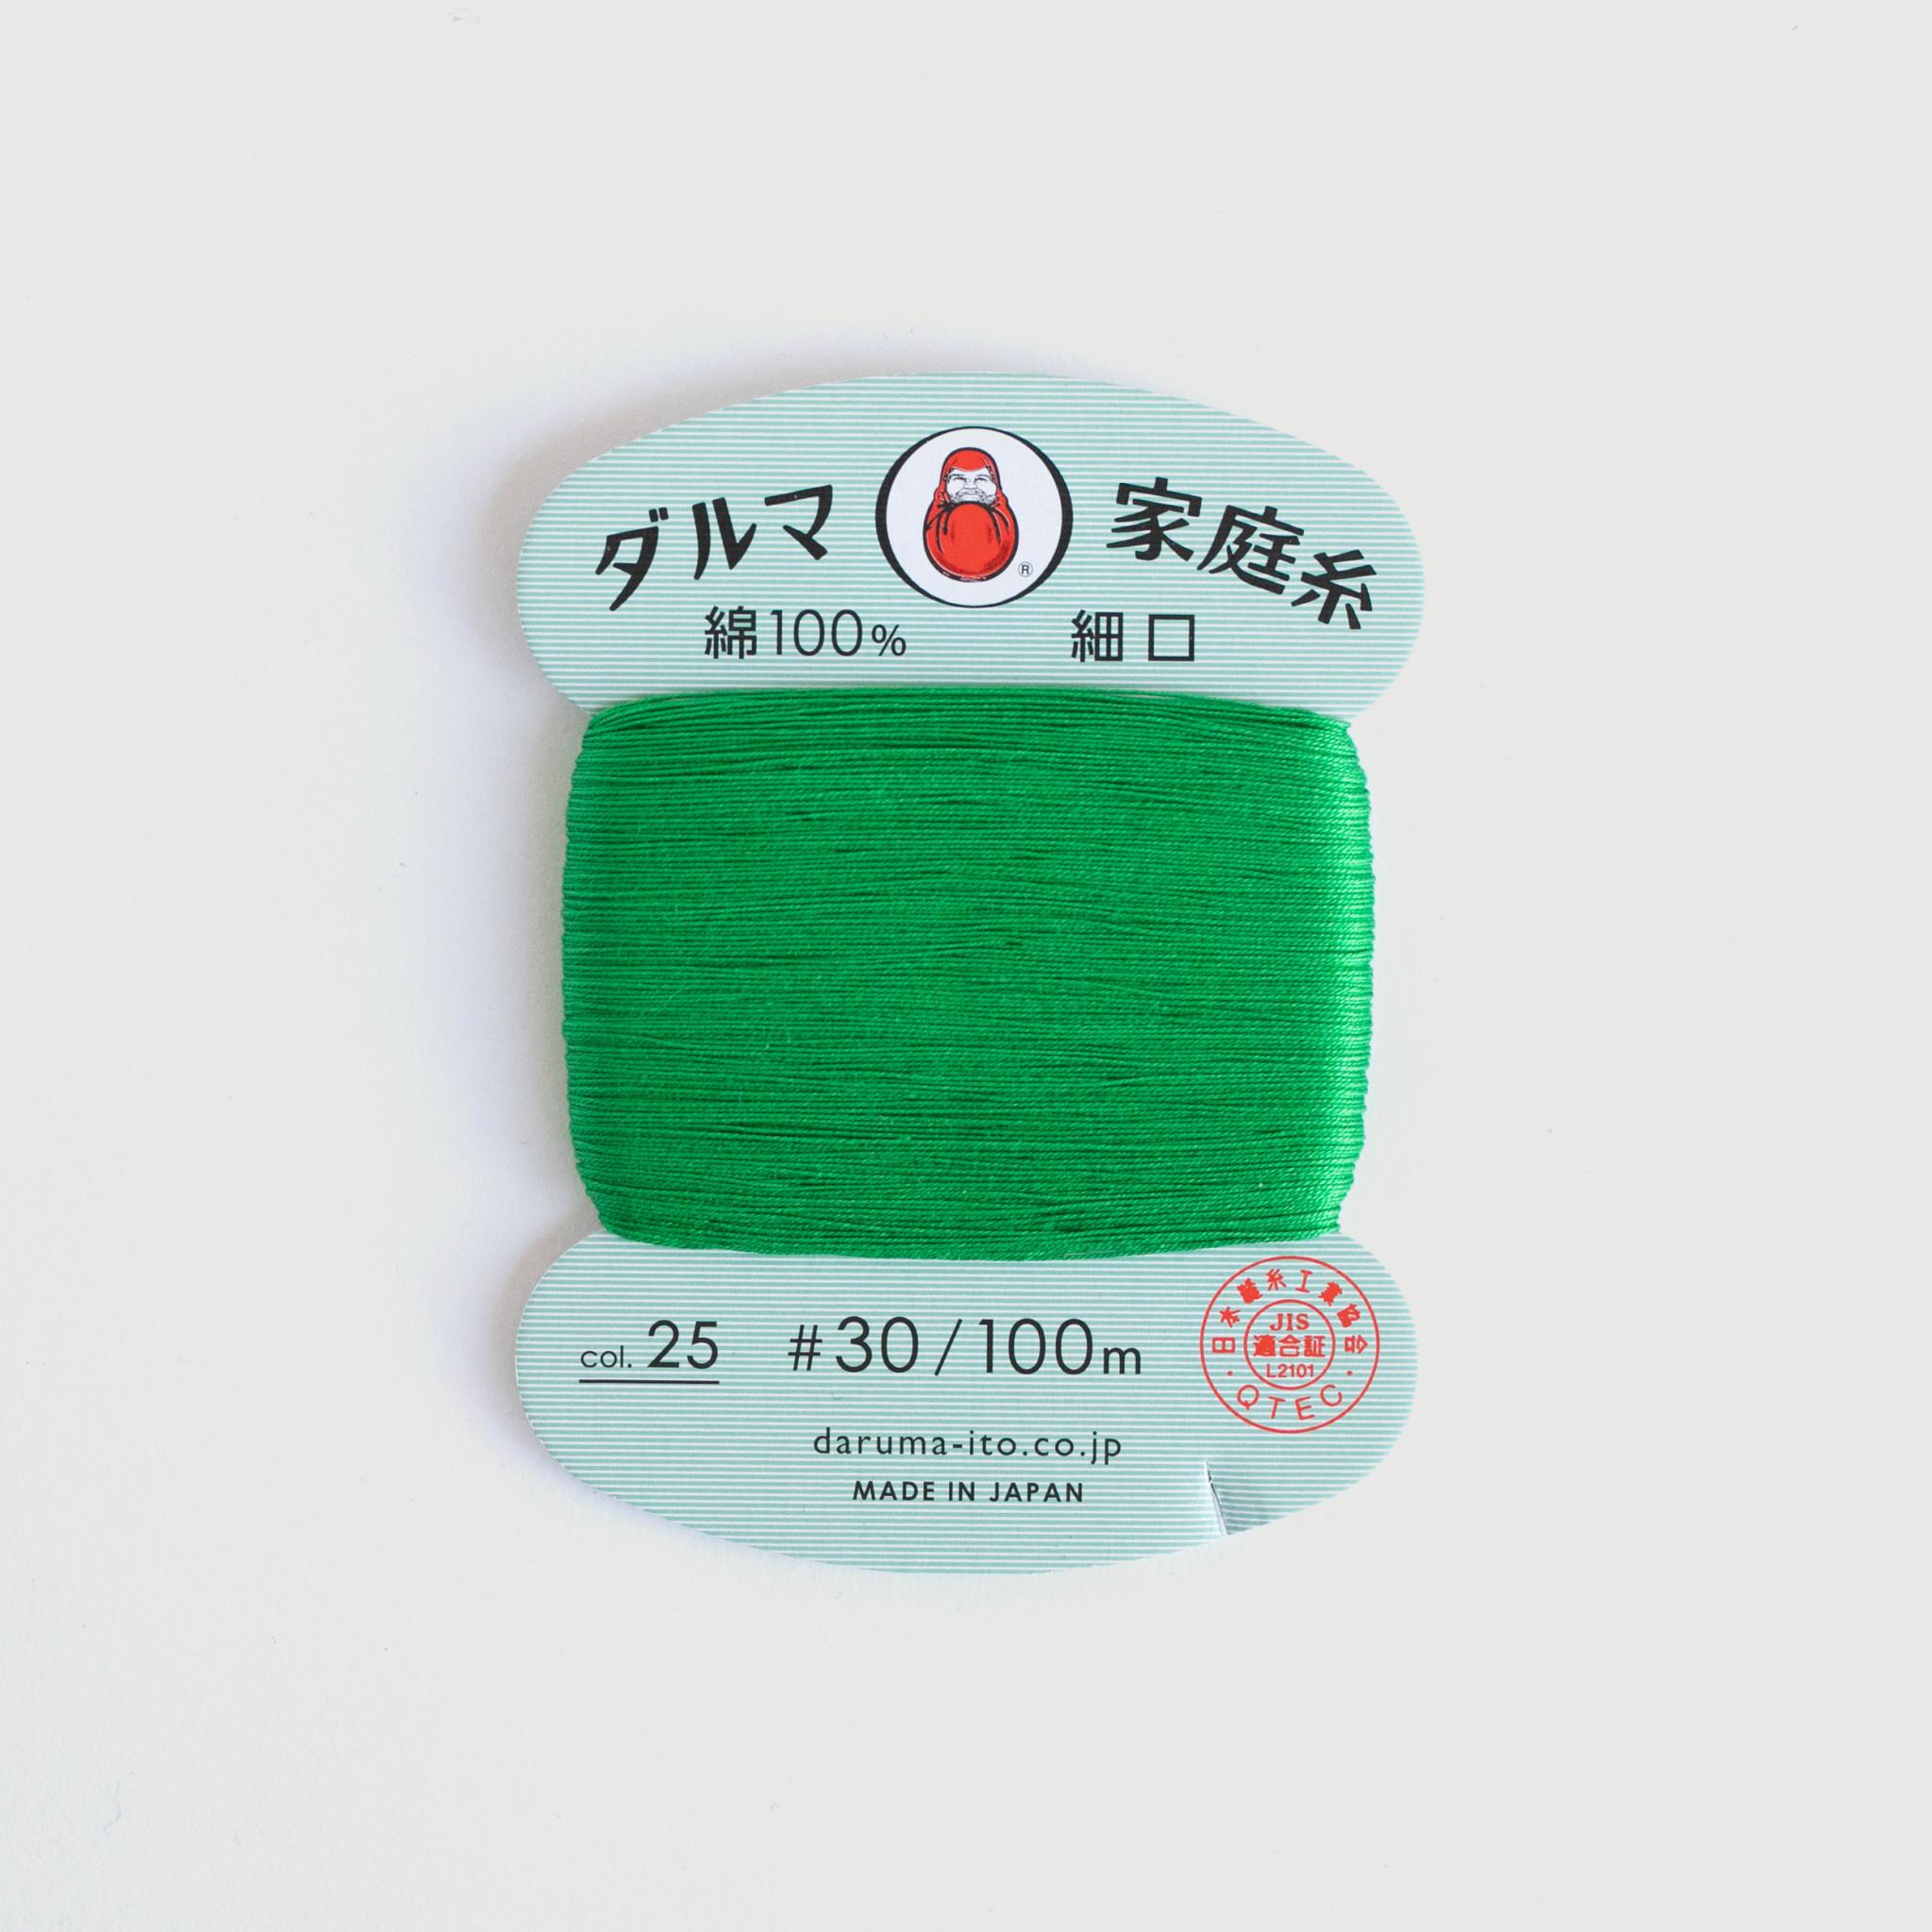 Daruma Daruma-Ito Home Thread #30 (Thin) 100m